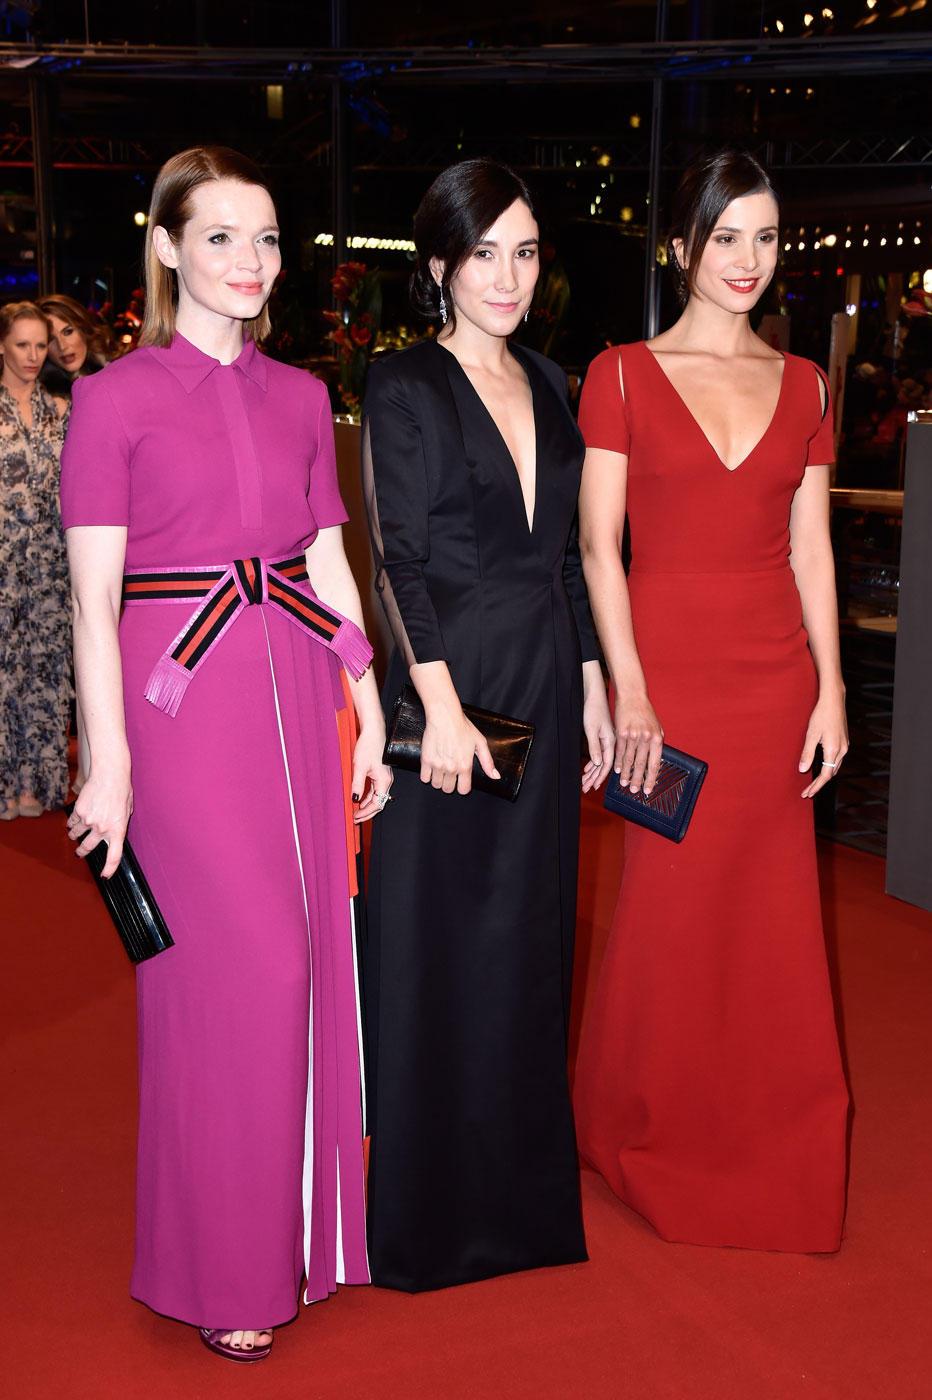 Berlinale 2016: Karoline Herfurth, Sibel Kekilli und Aylin Tezel